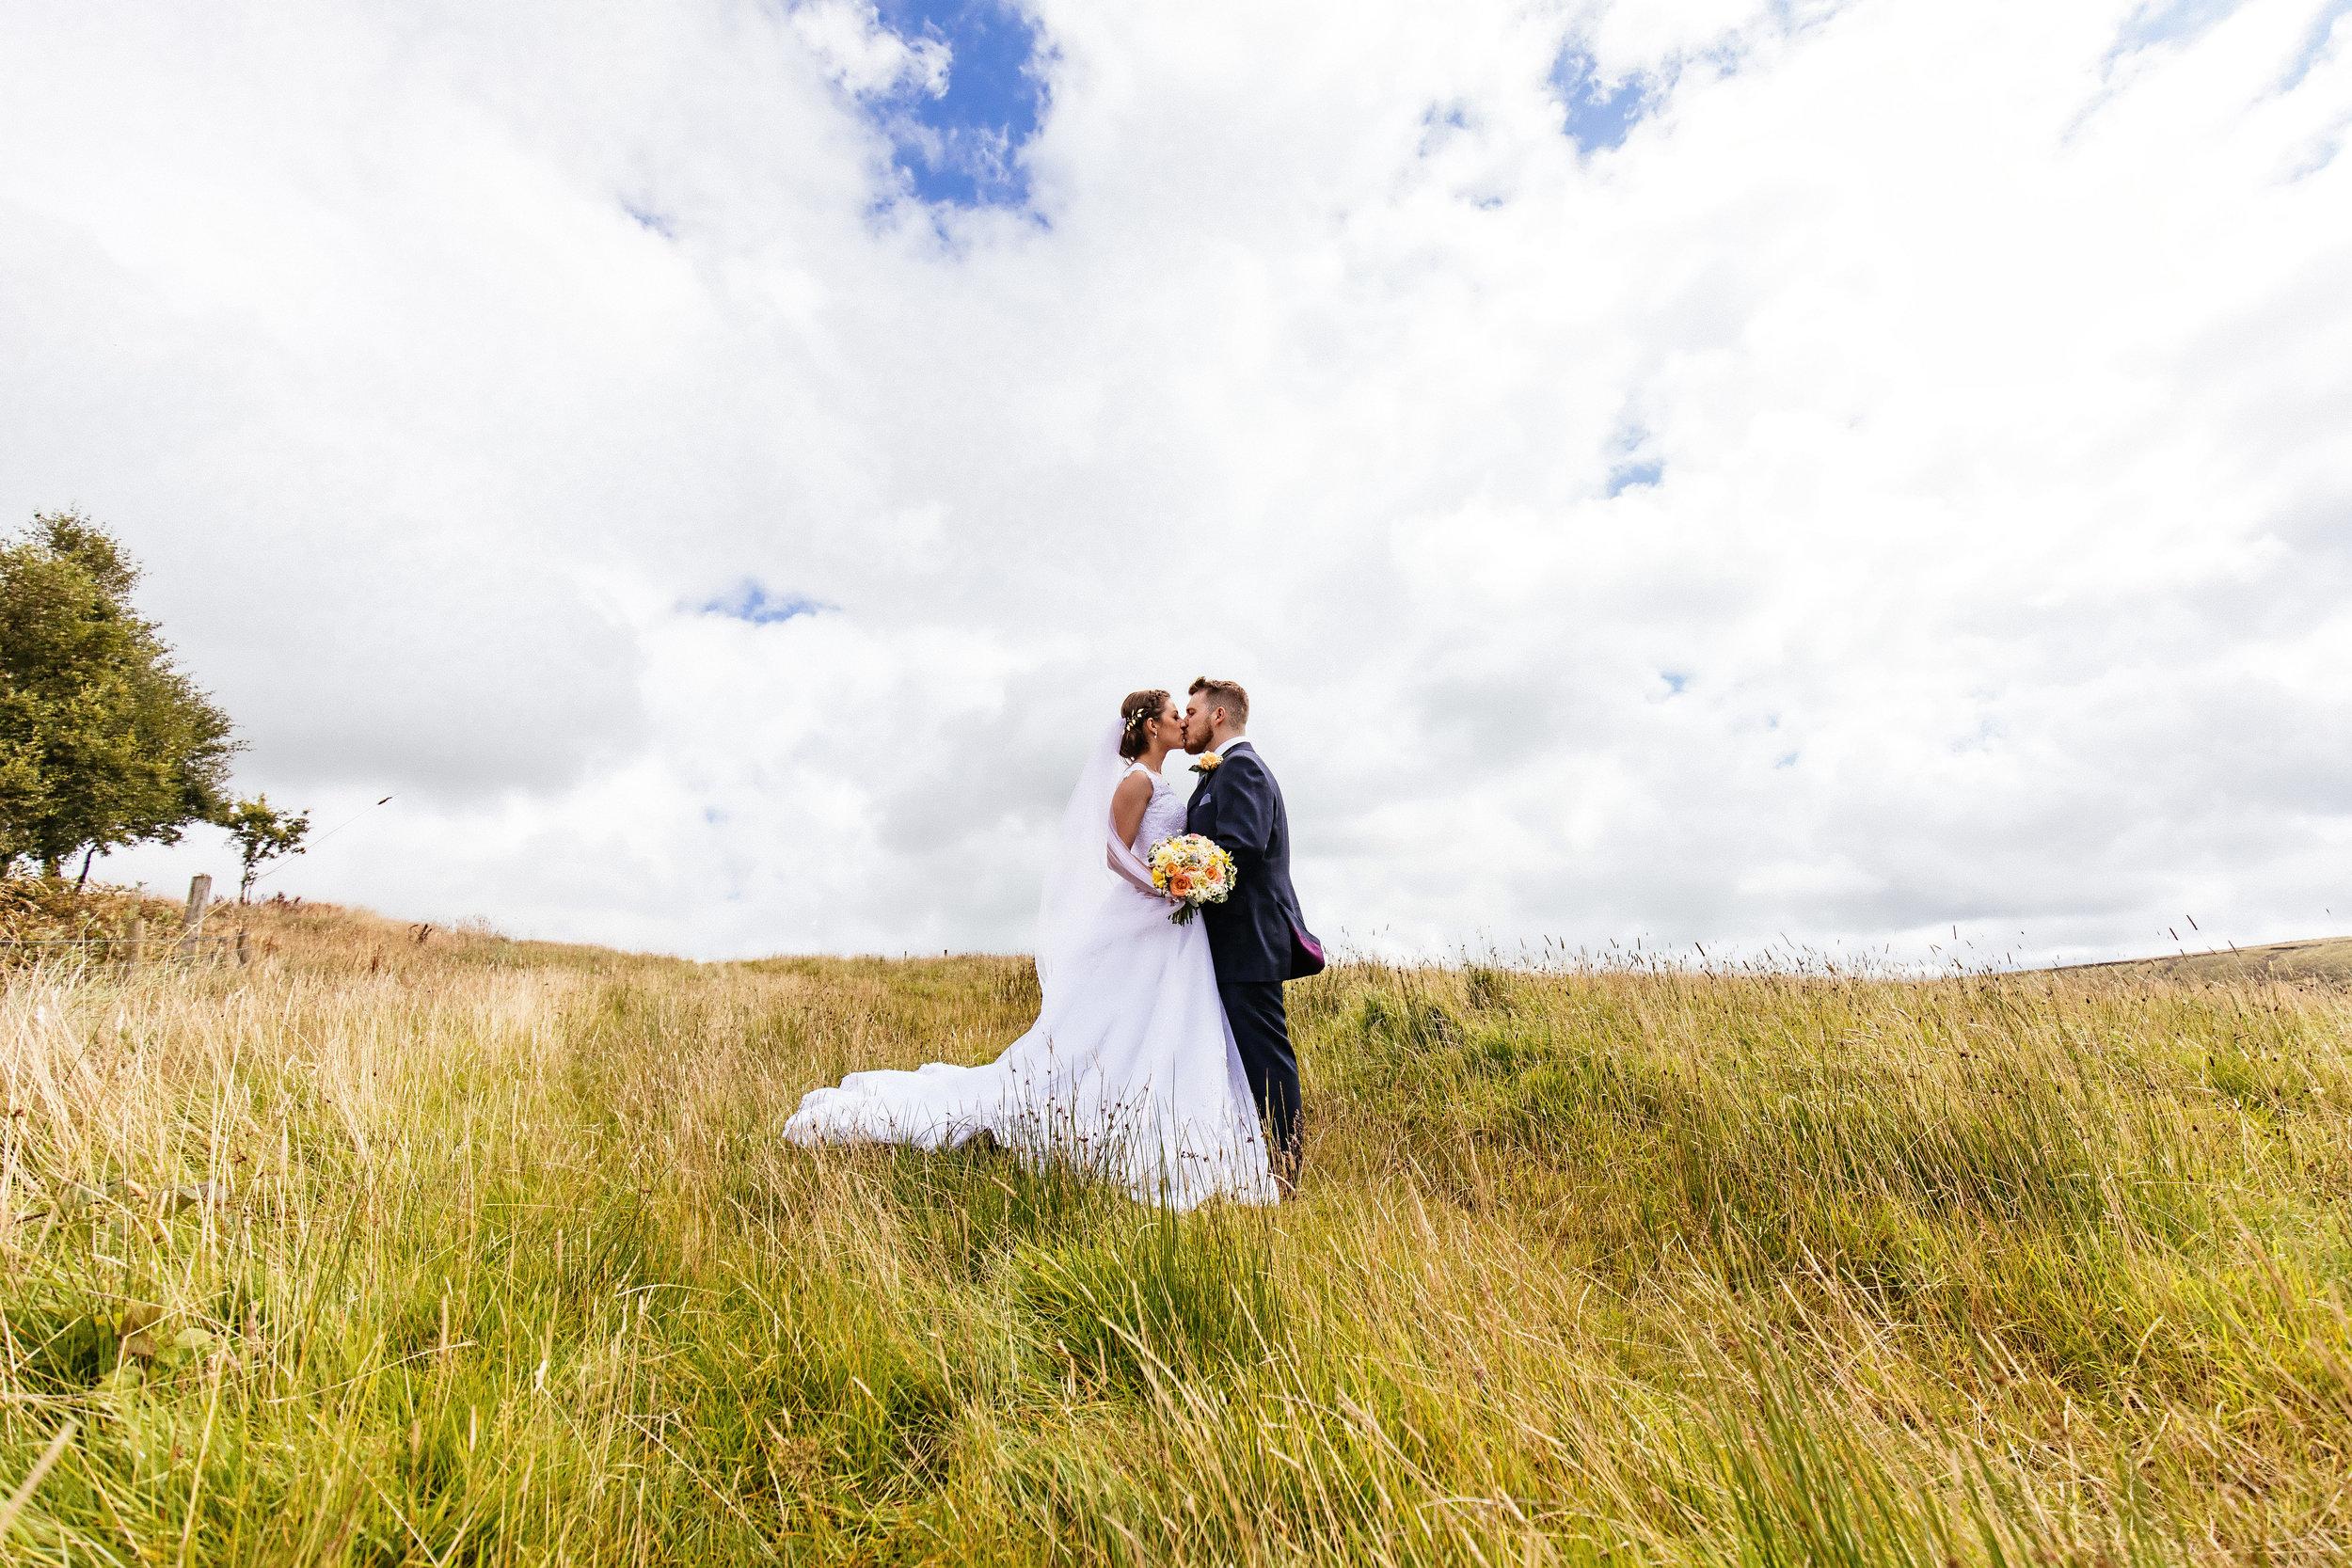 Kathryn-and-Mike-Wedding-Highlights-70.jpg